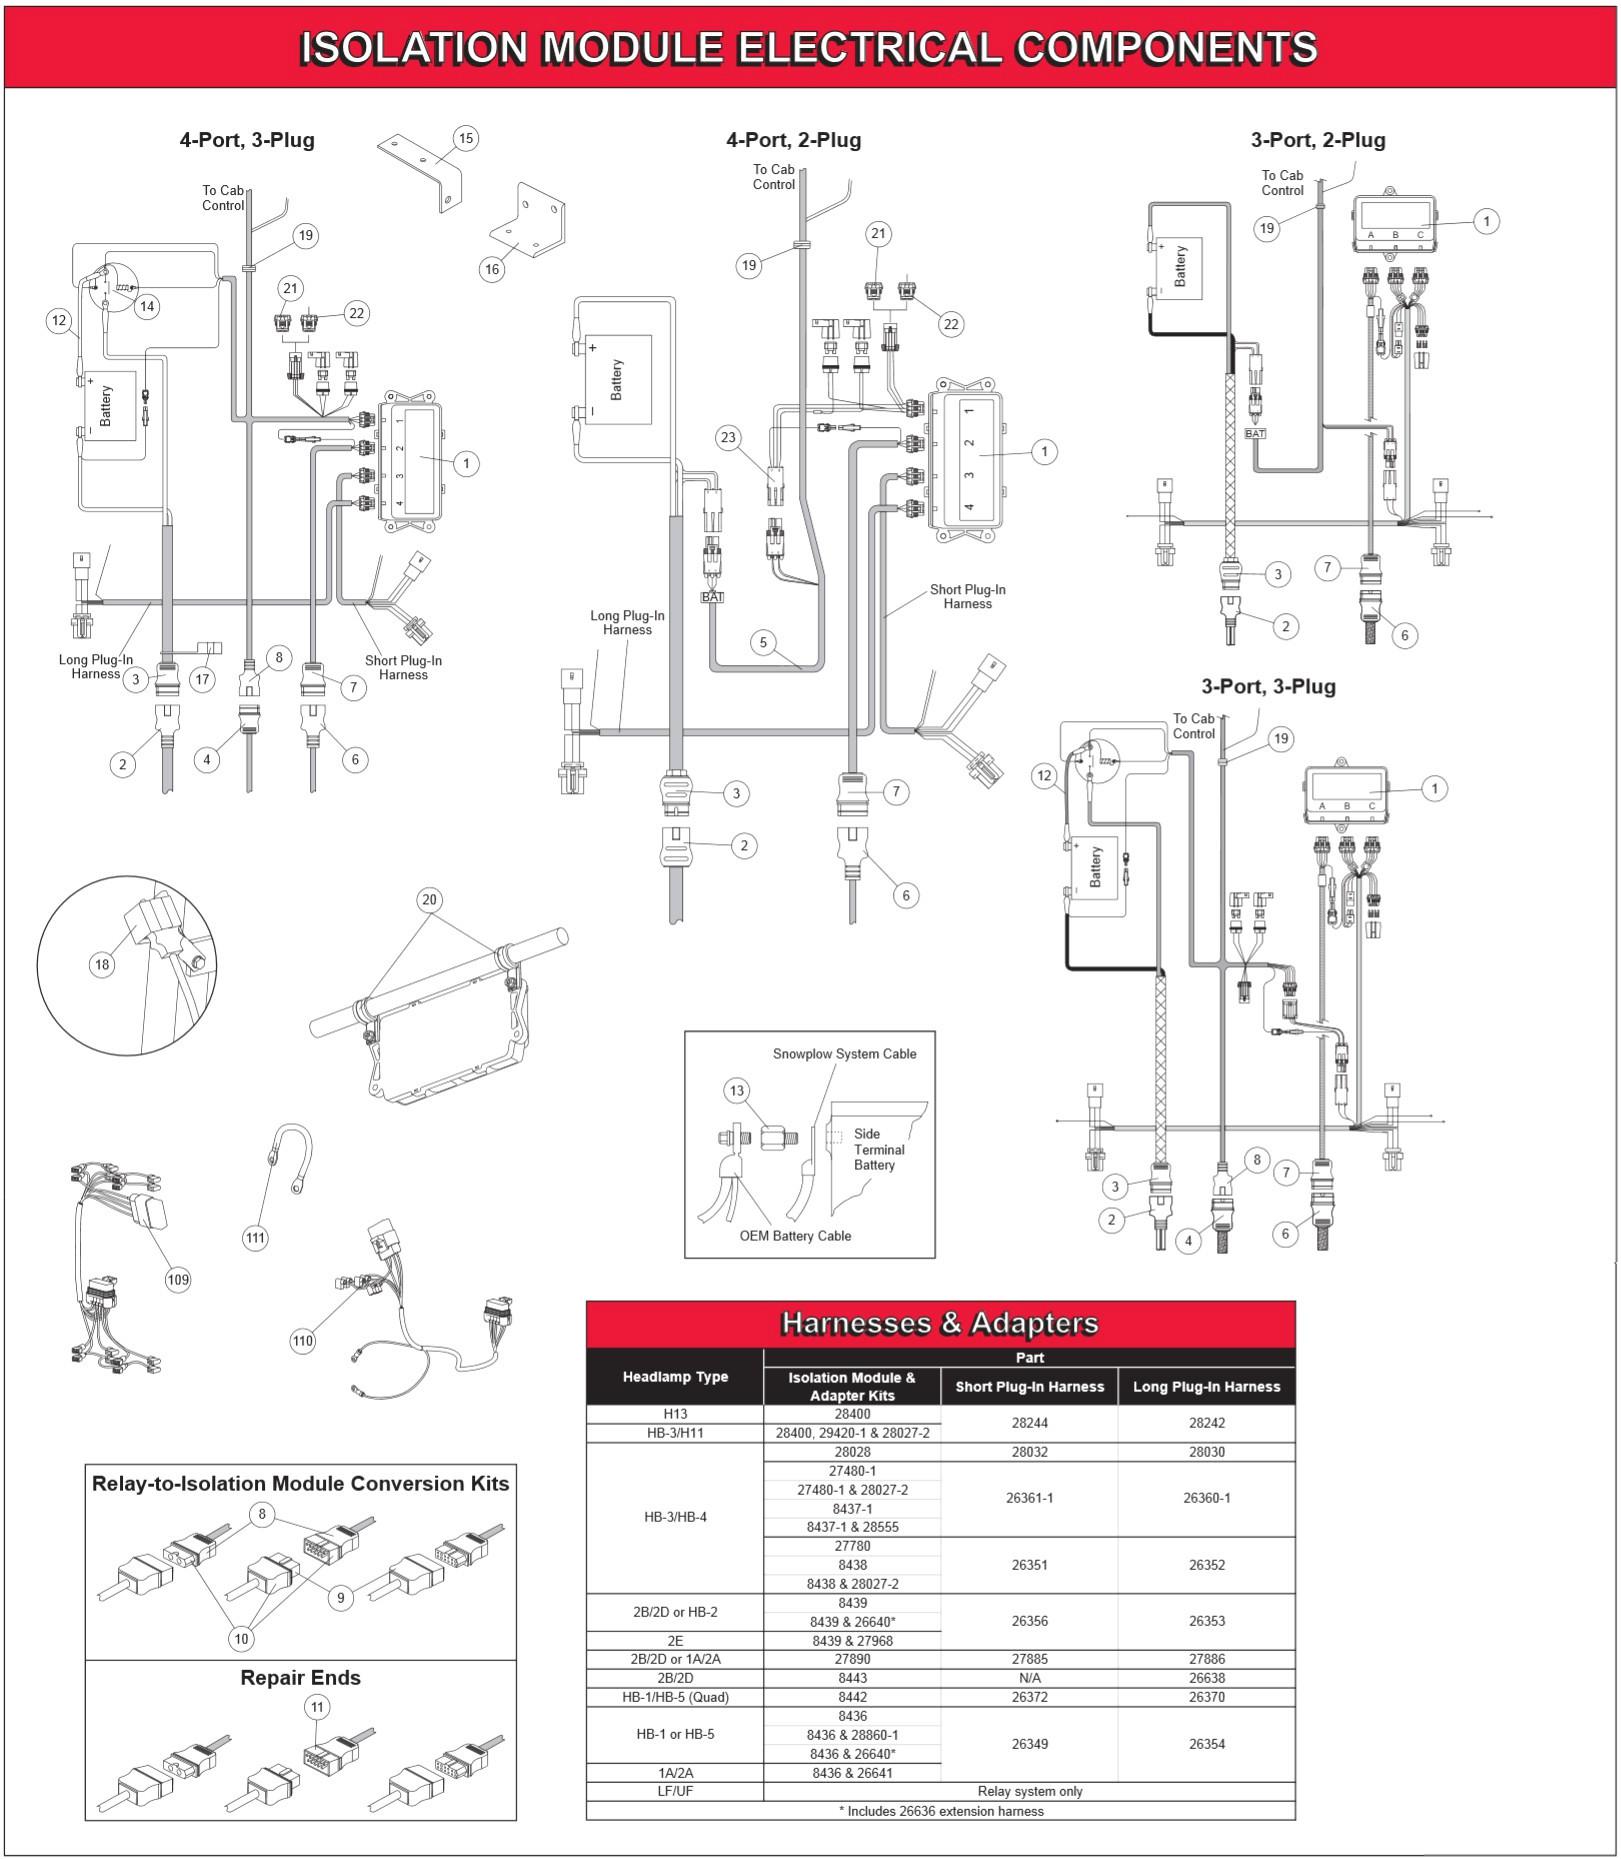 TZ_6119] Meyer Snow Plow Meyer Snow Plow Wiring DiagramFlui Erbug Reda Capem Mohammedshrine Librar Wiring 101